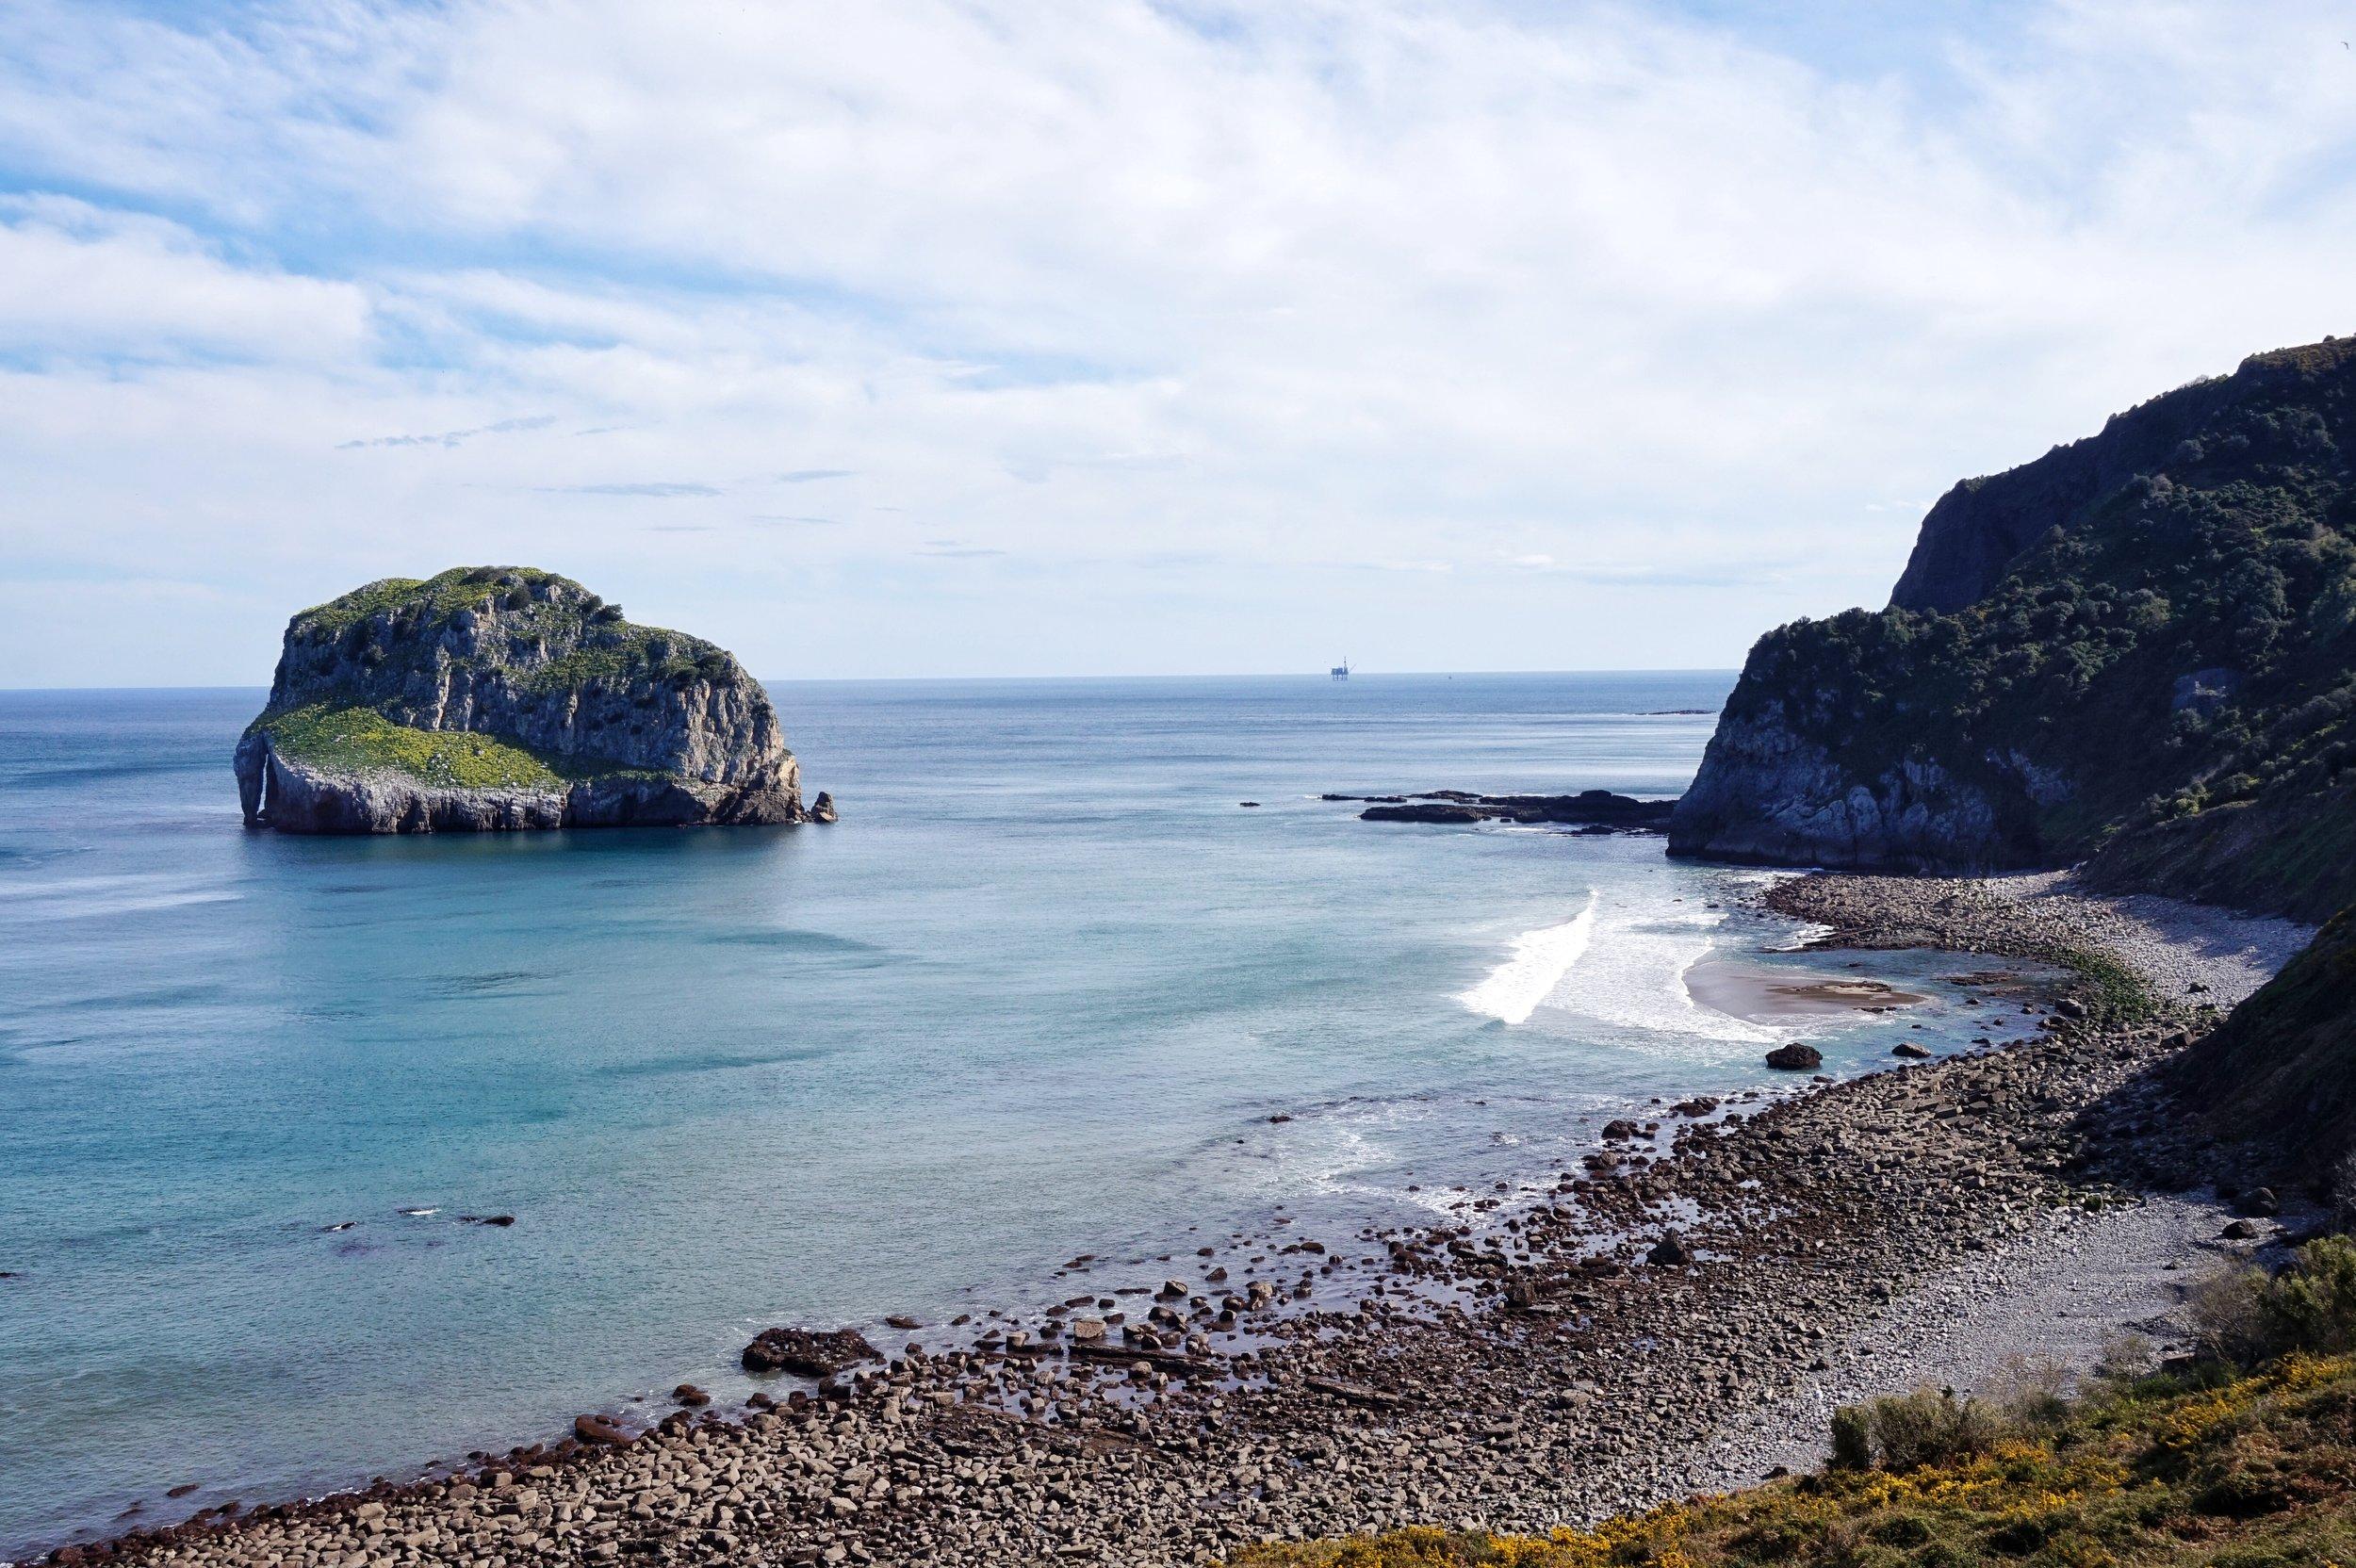 SAN JUAN DE GAZTELUGATXE'S SEA VIEWS